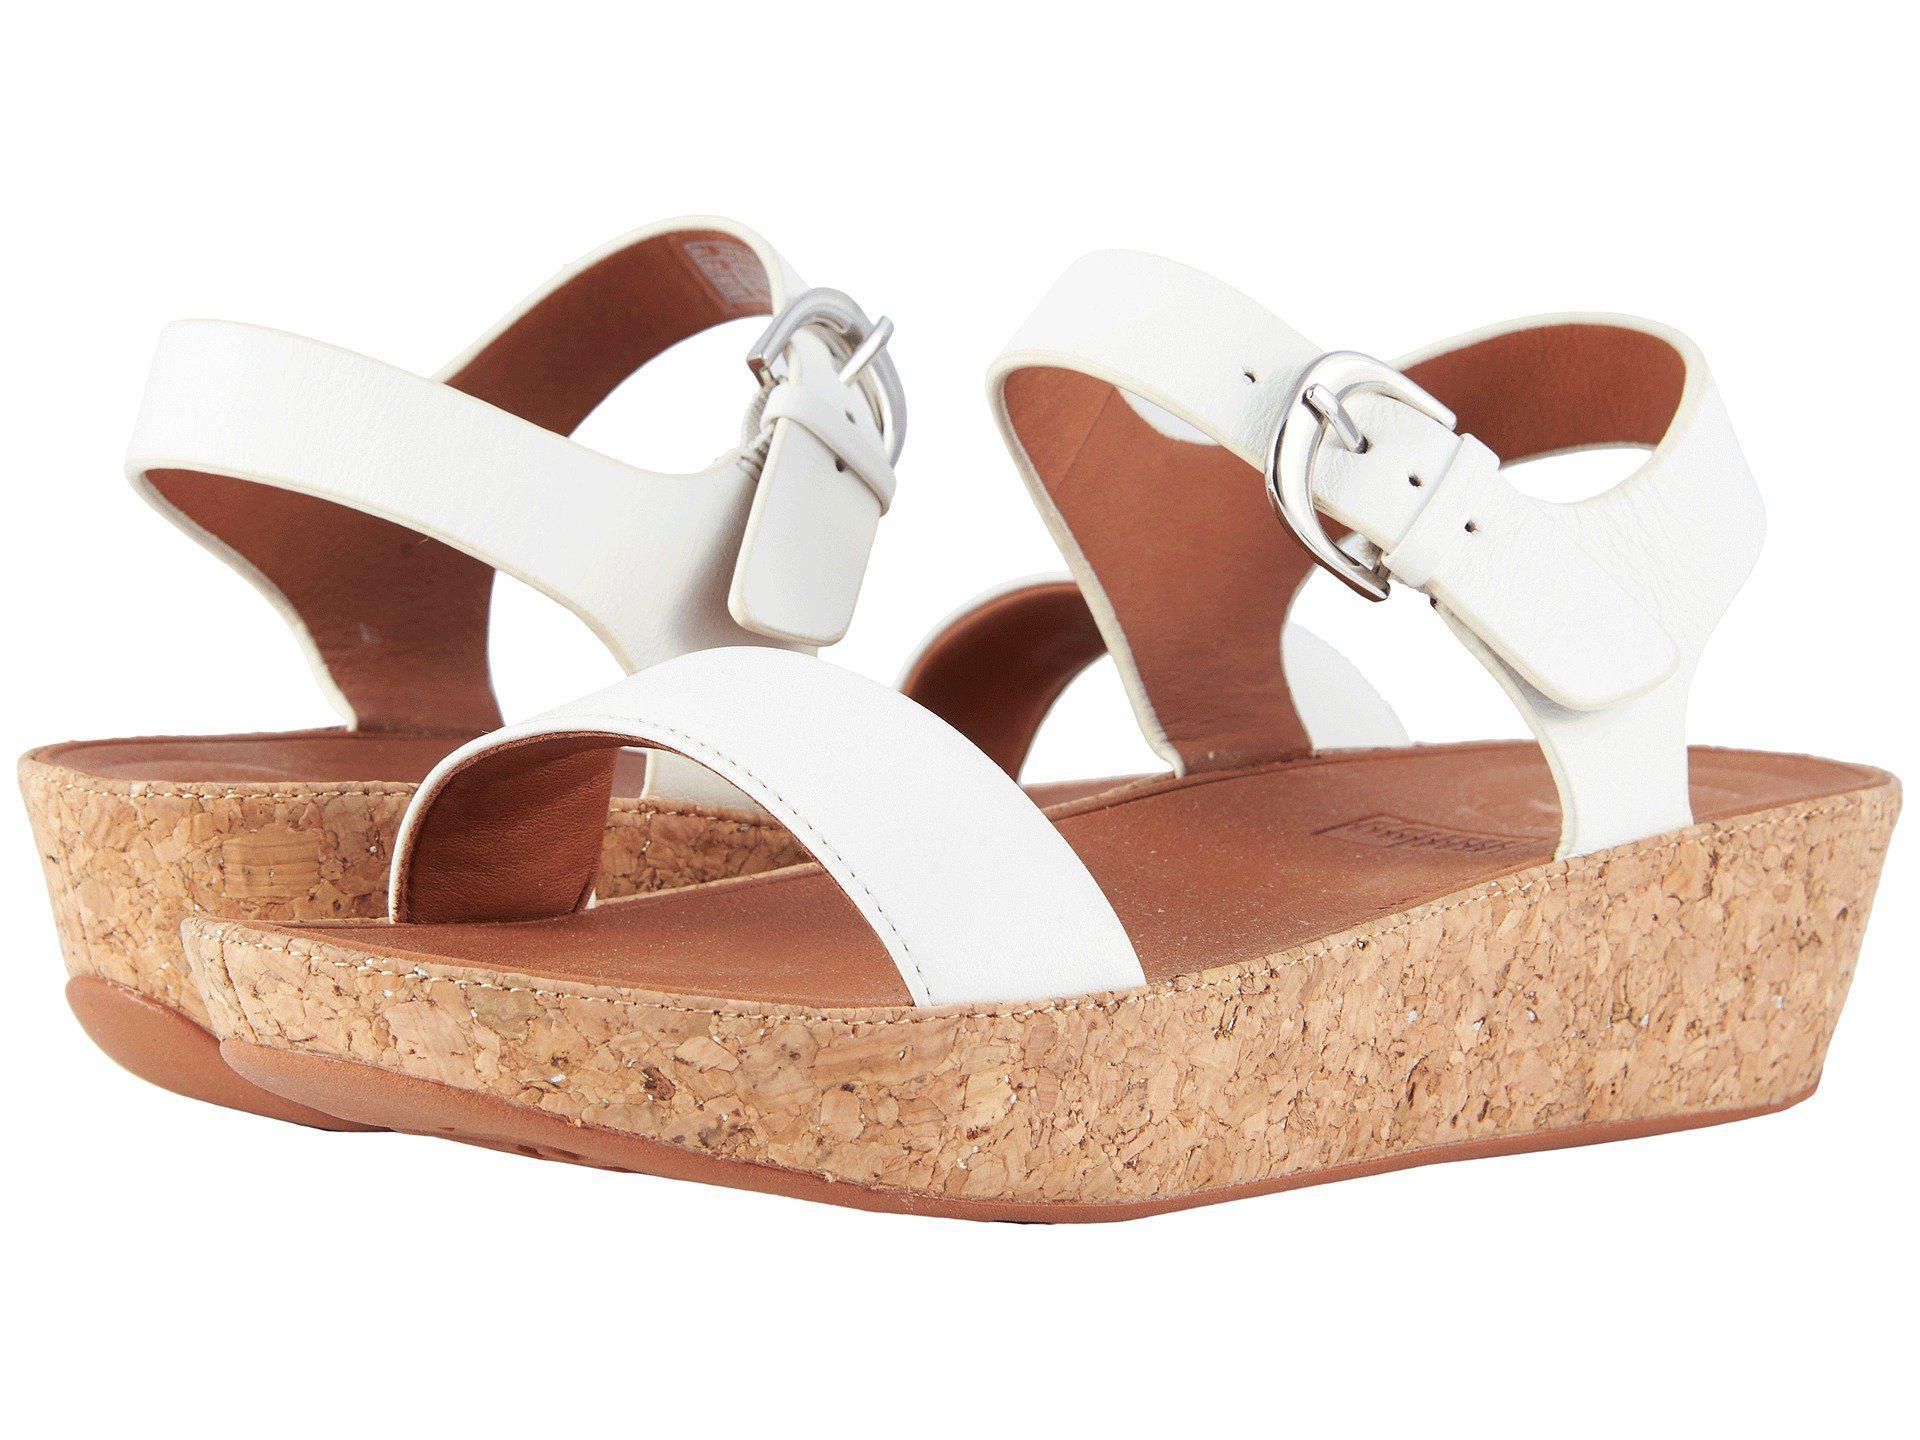 Womens Bon Ii Back-Strap Iridescent Open Toe Sandals FitFlop OgsLi5v5gZ